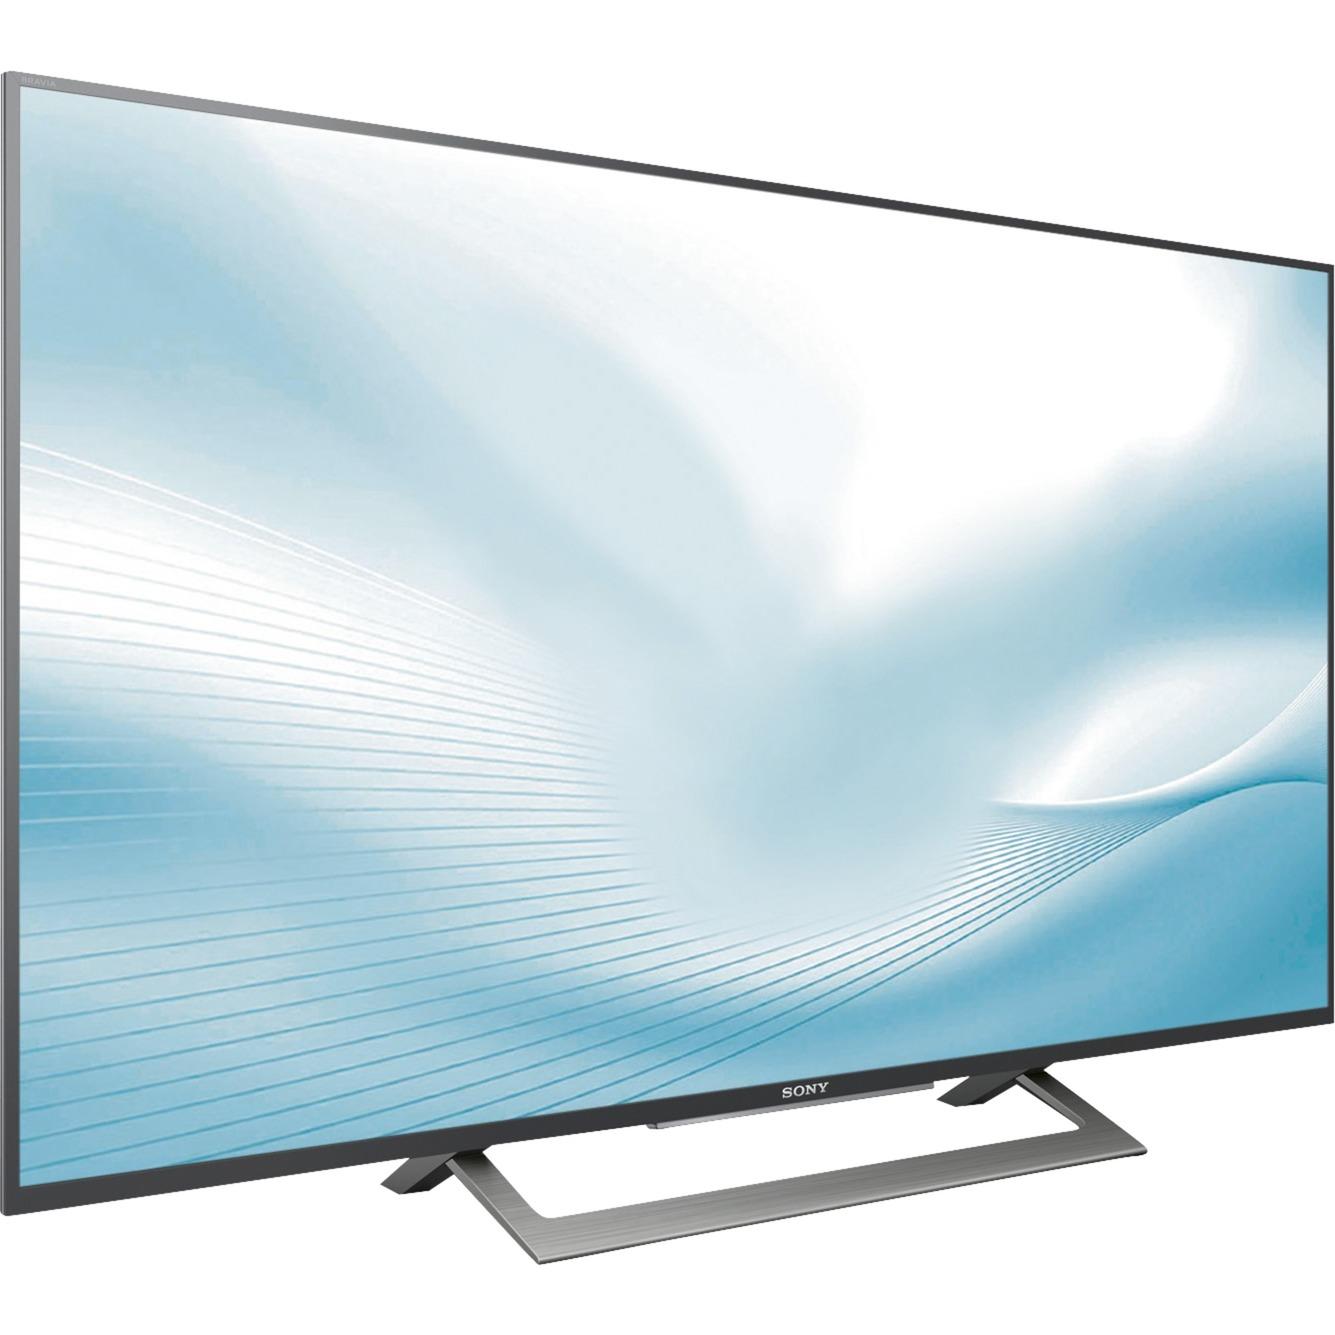 KD43XD8099BAEP, LED-tv